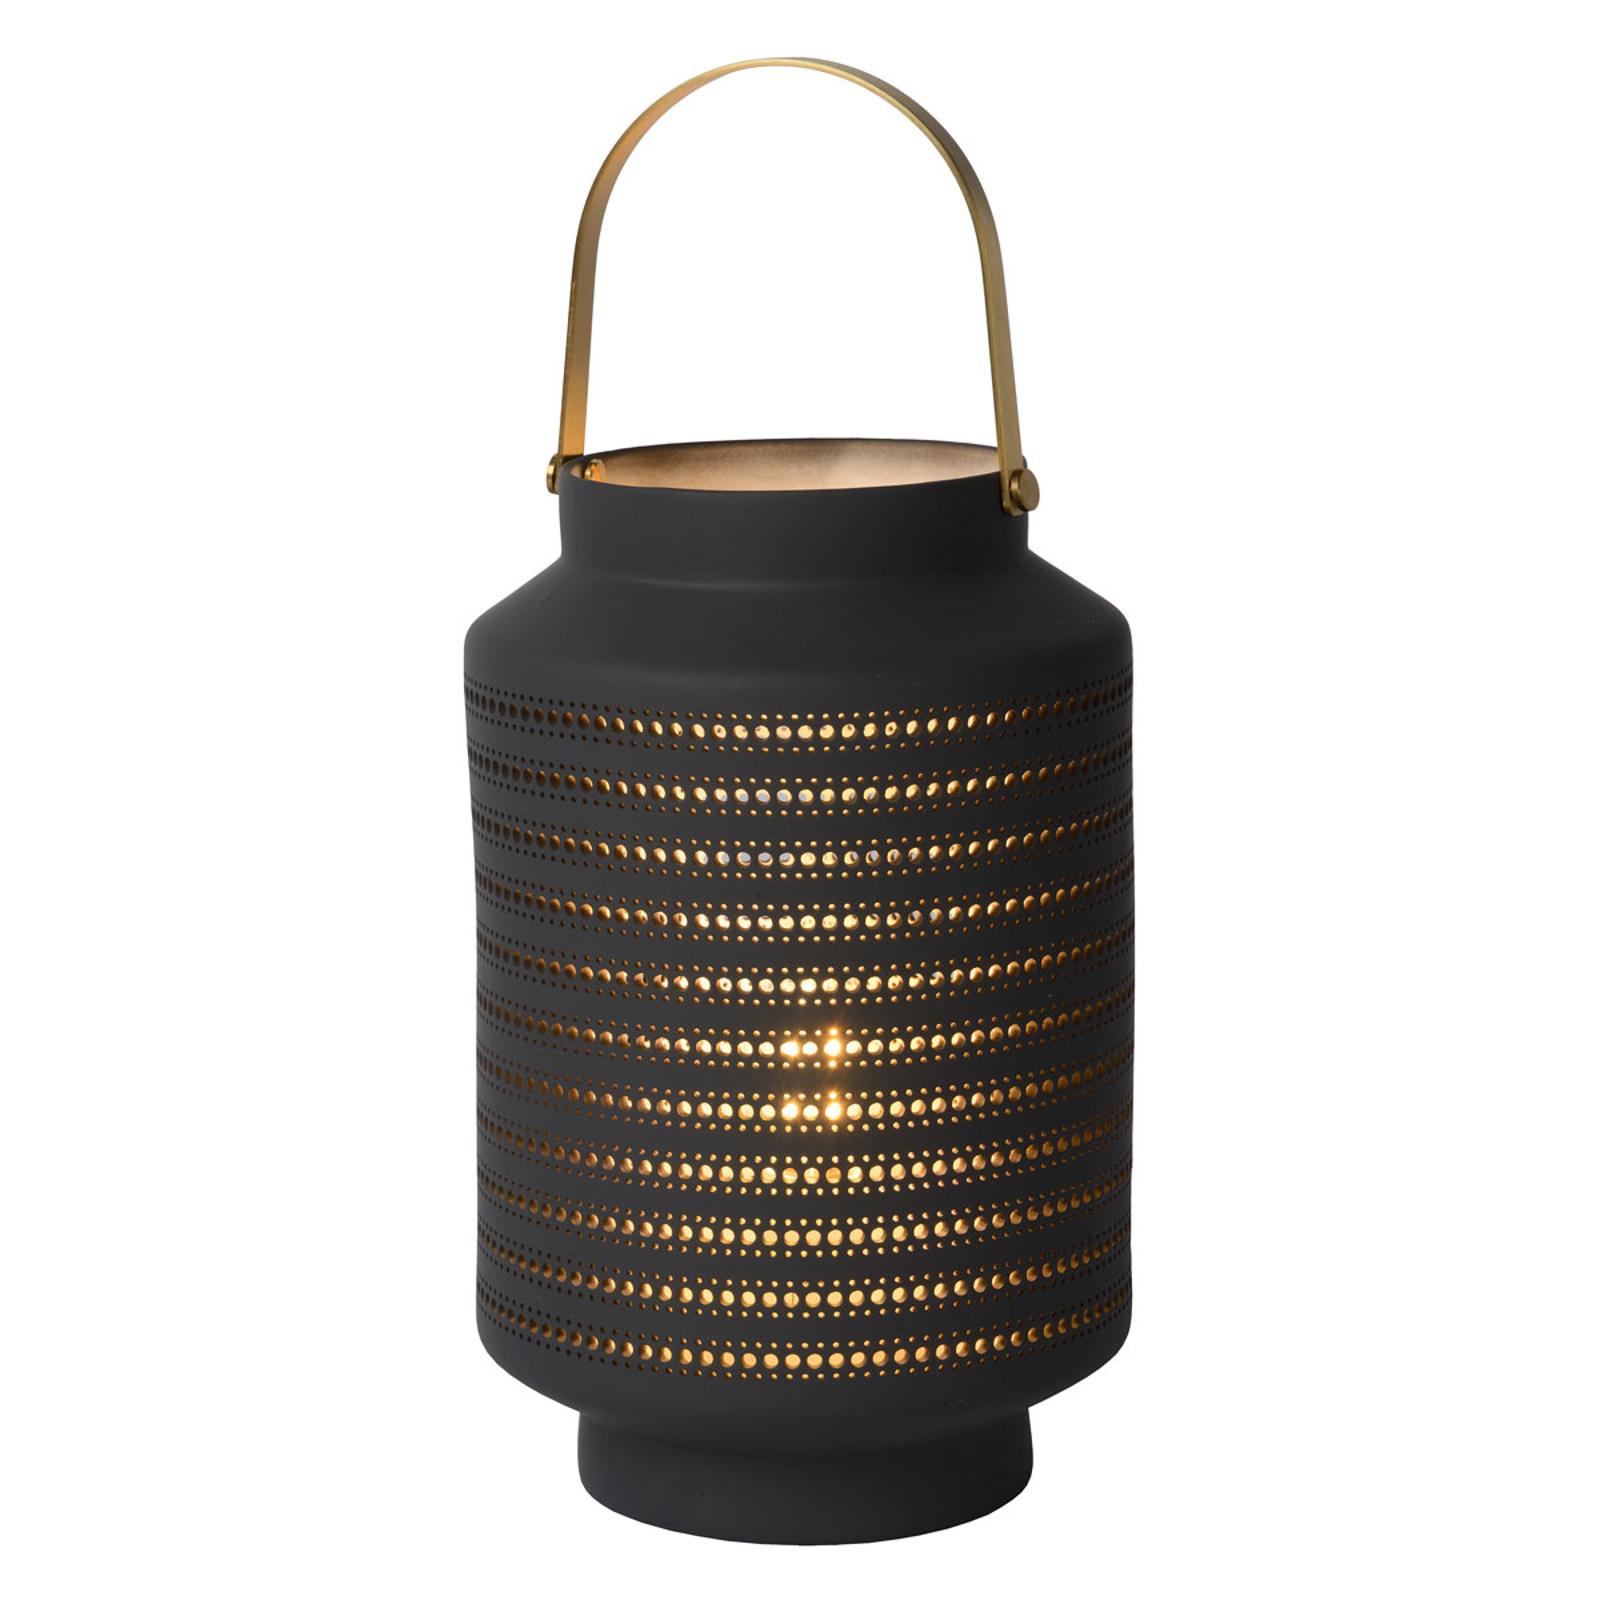 Tafellamp Jamila van porselein, antraciet